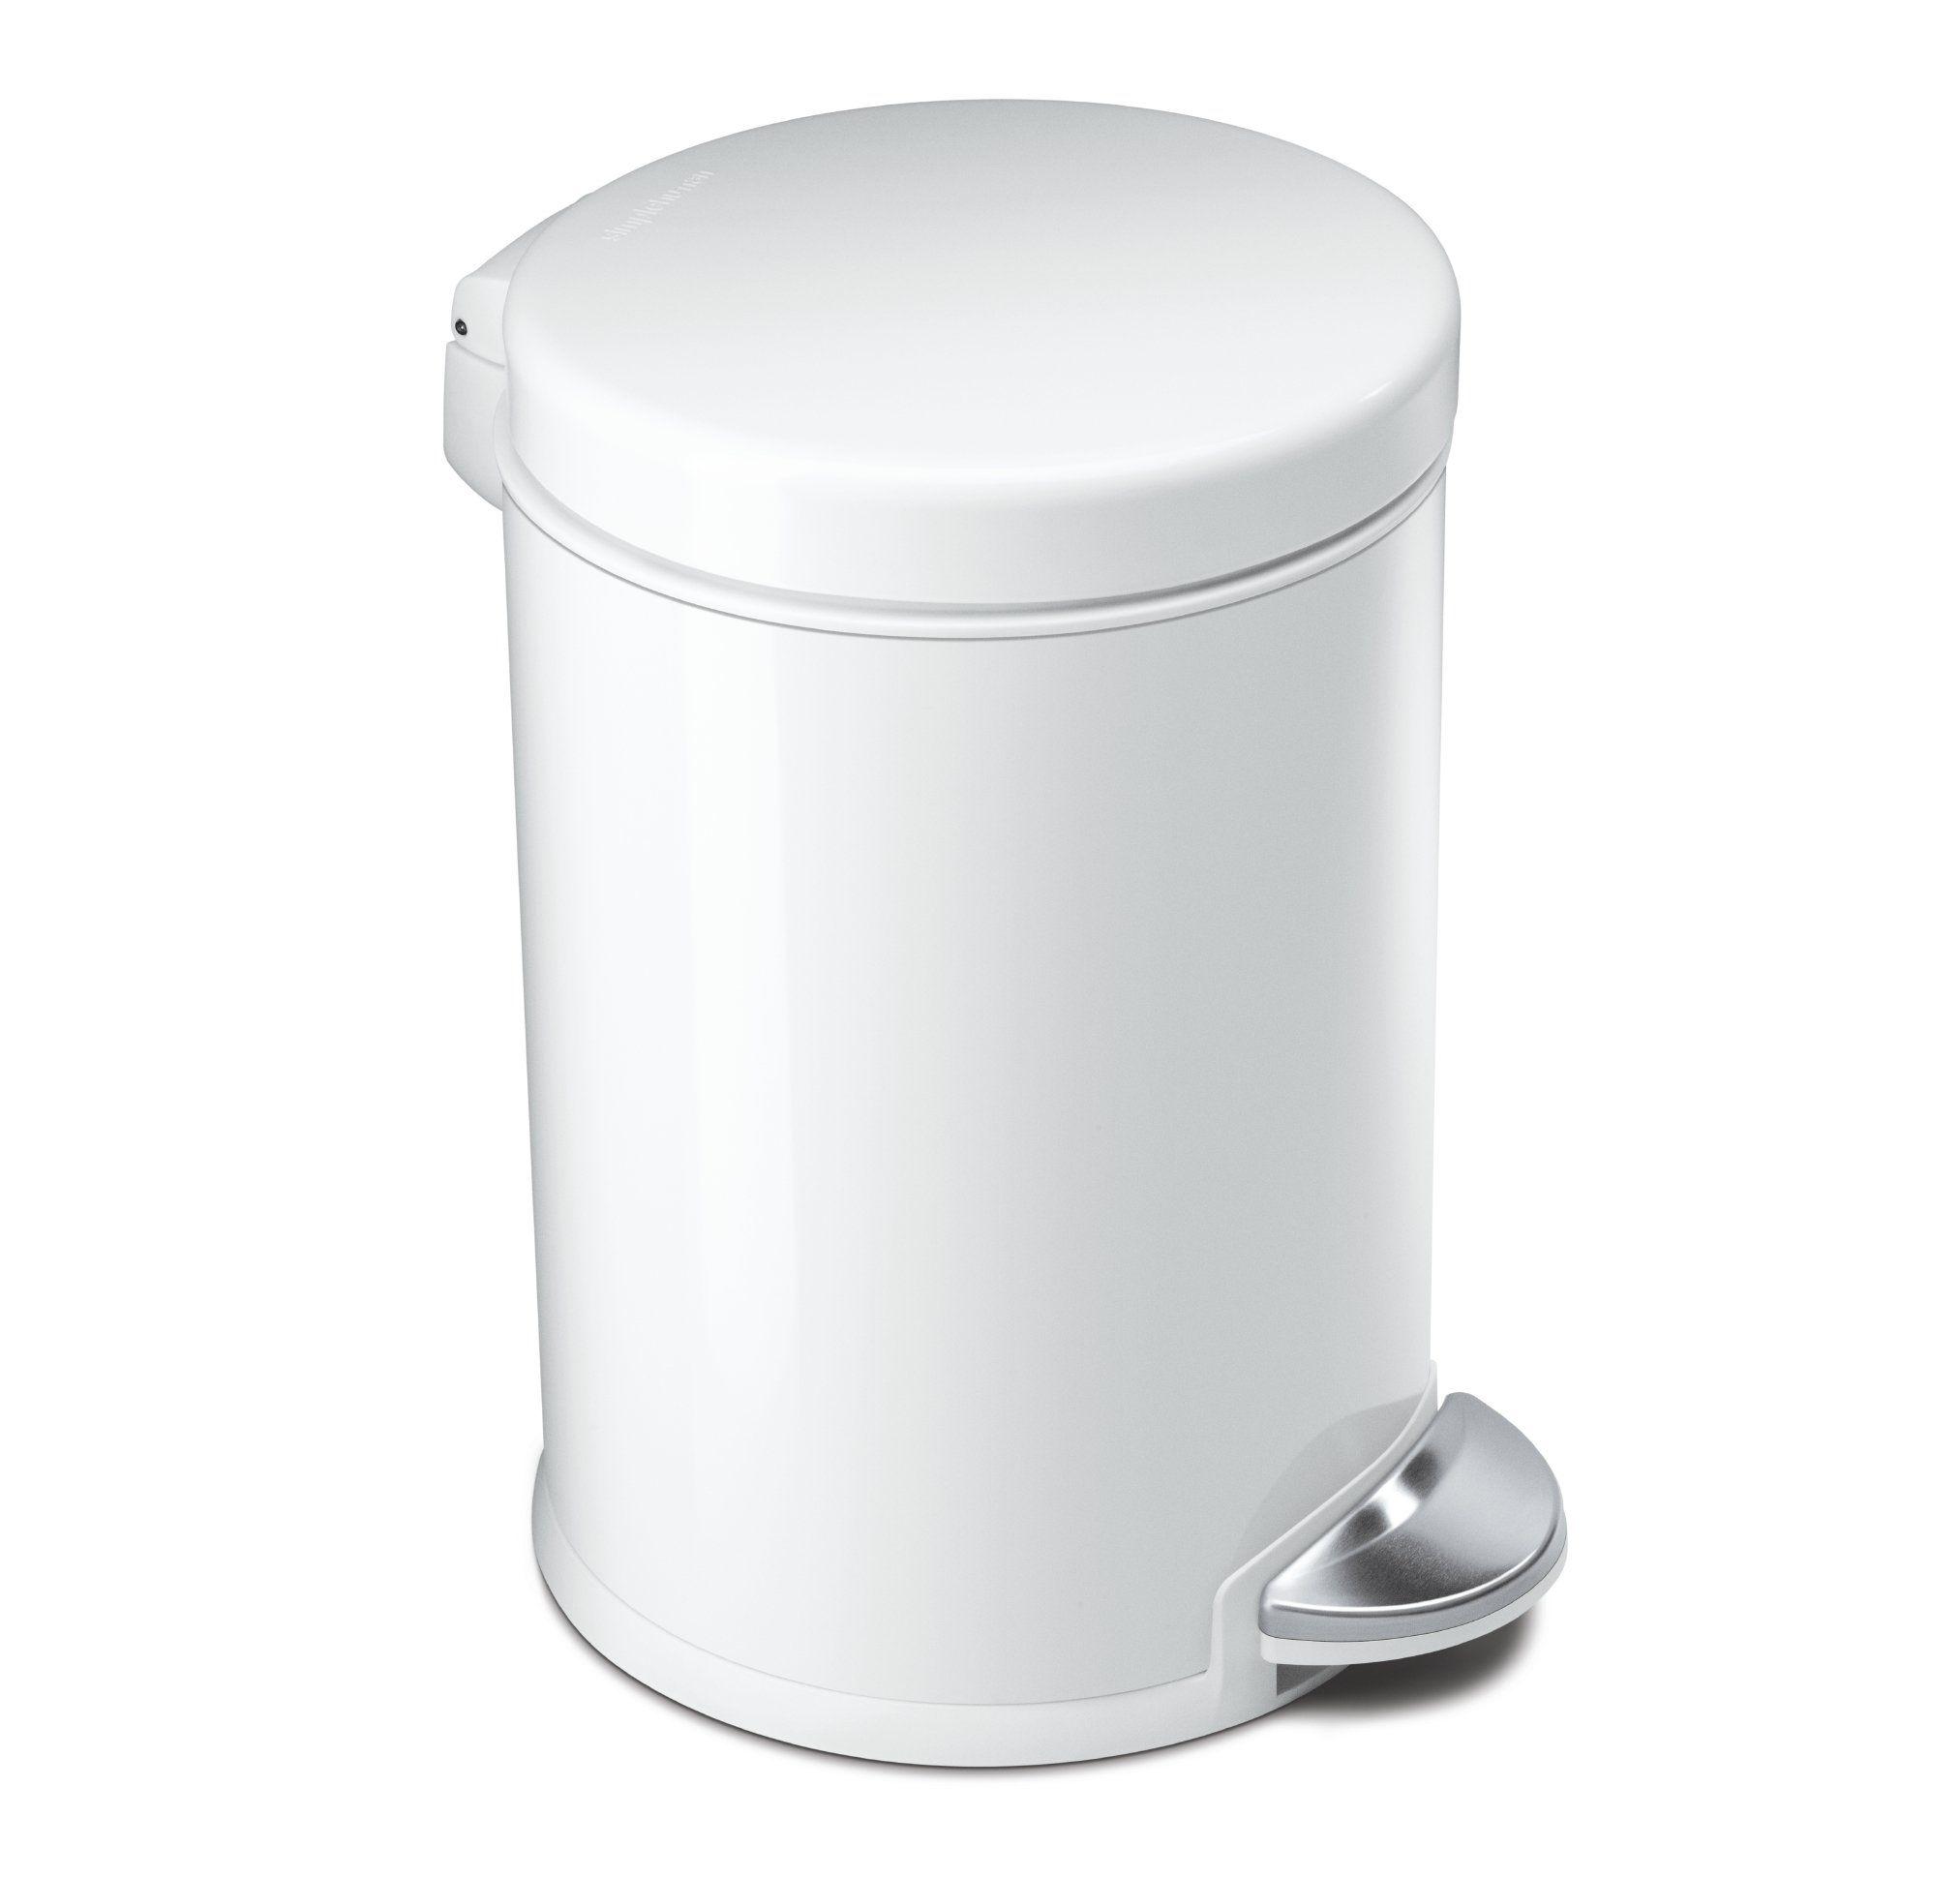 Simplehuman Mini Round Step Trash Can White Steel 4 5 L 1 2 Gal Kitchen Trash Cans Modern Kitchen Trash Cans Trash Can